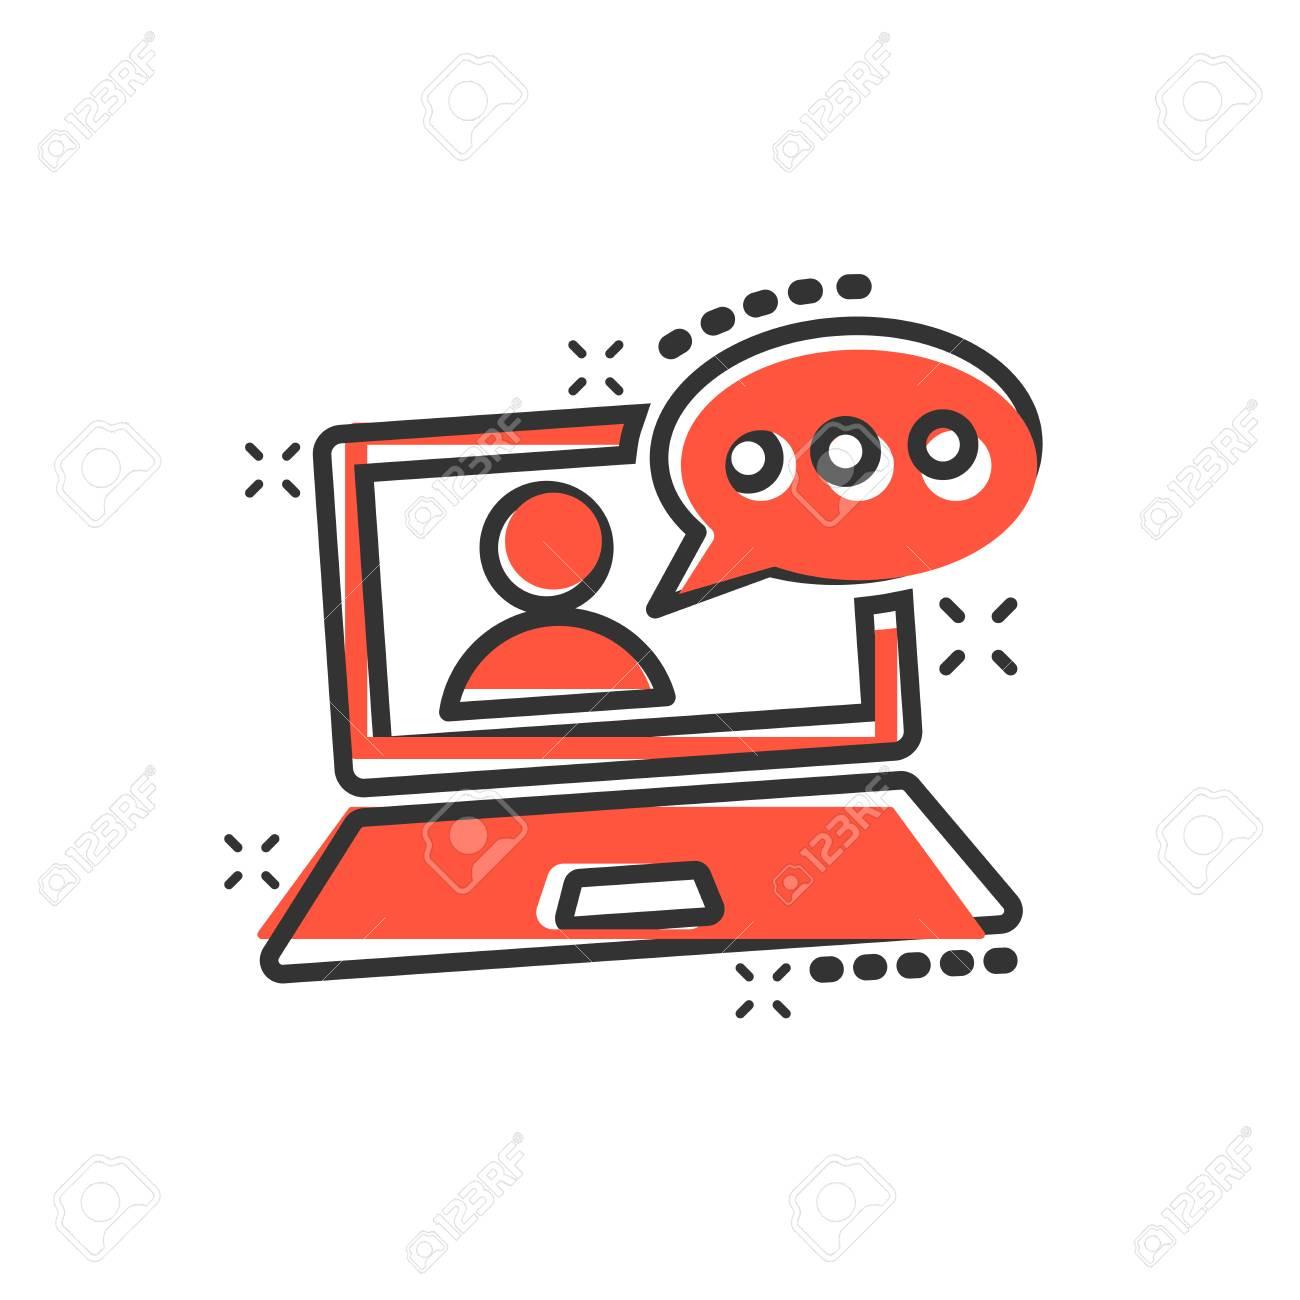 Online training process icon in comic style webinar seminar vector cartoon illustration pictogram e